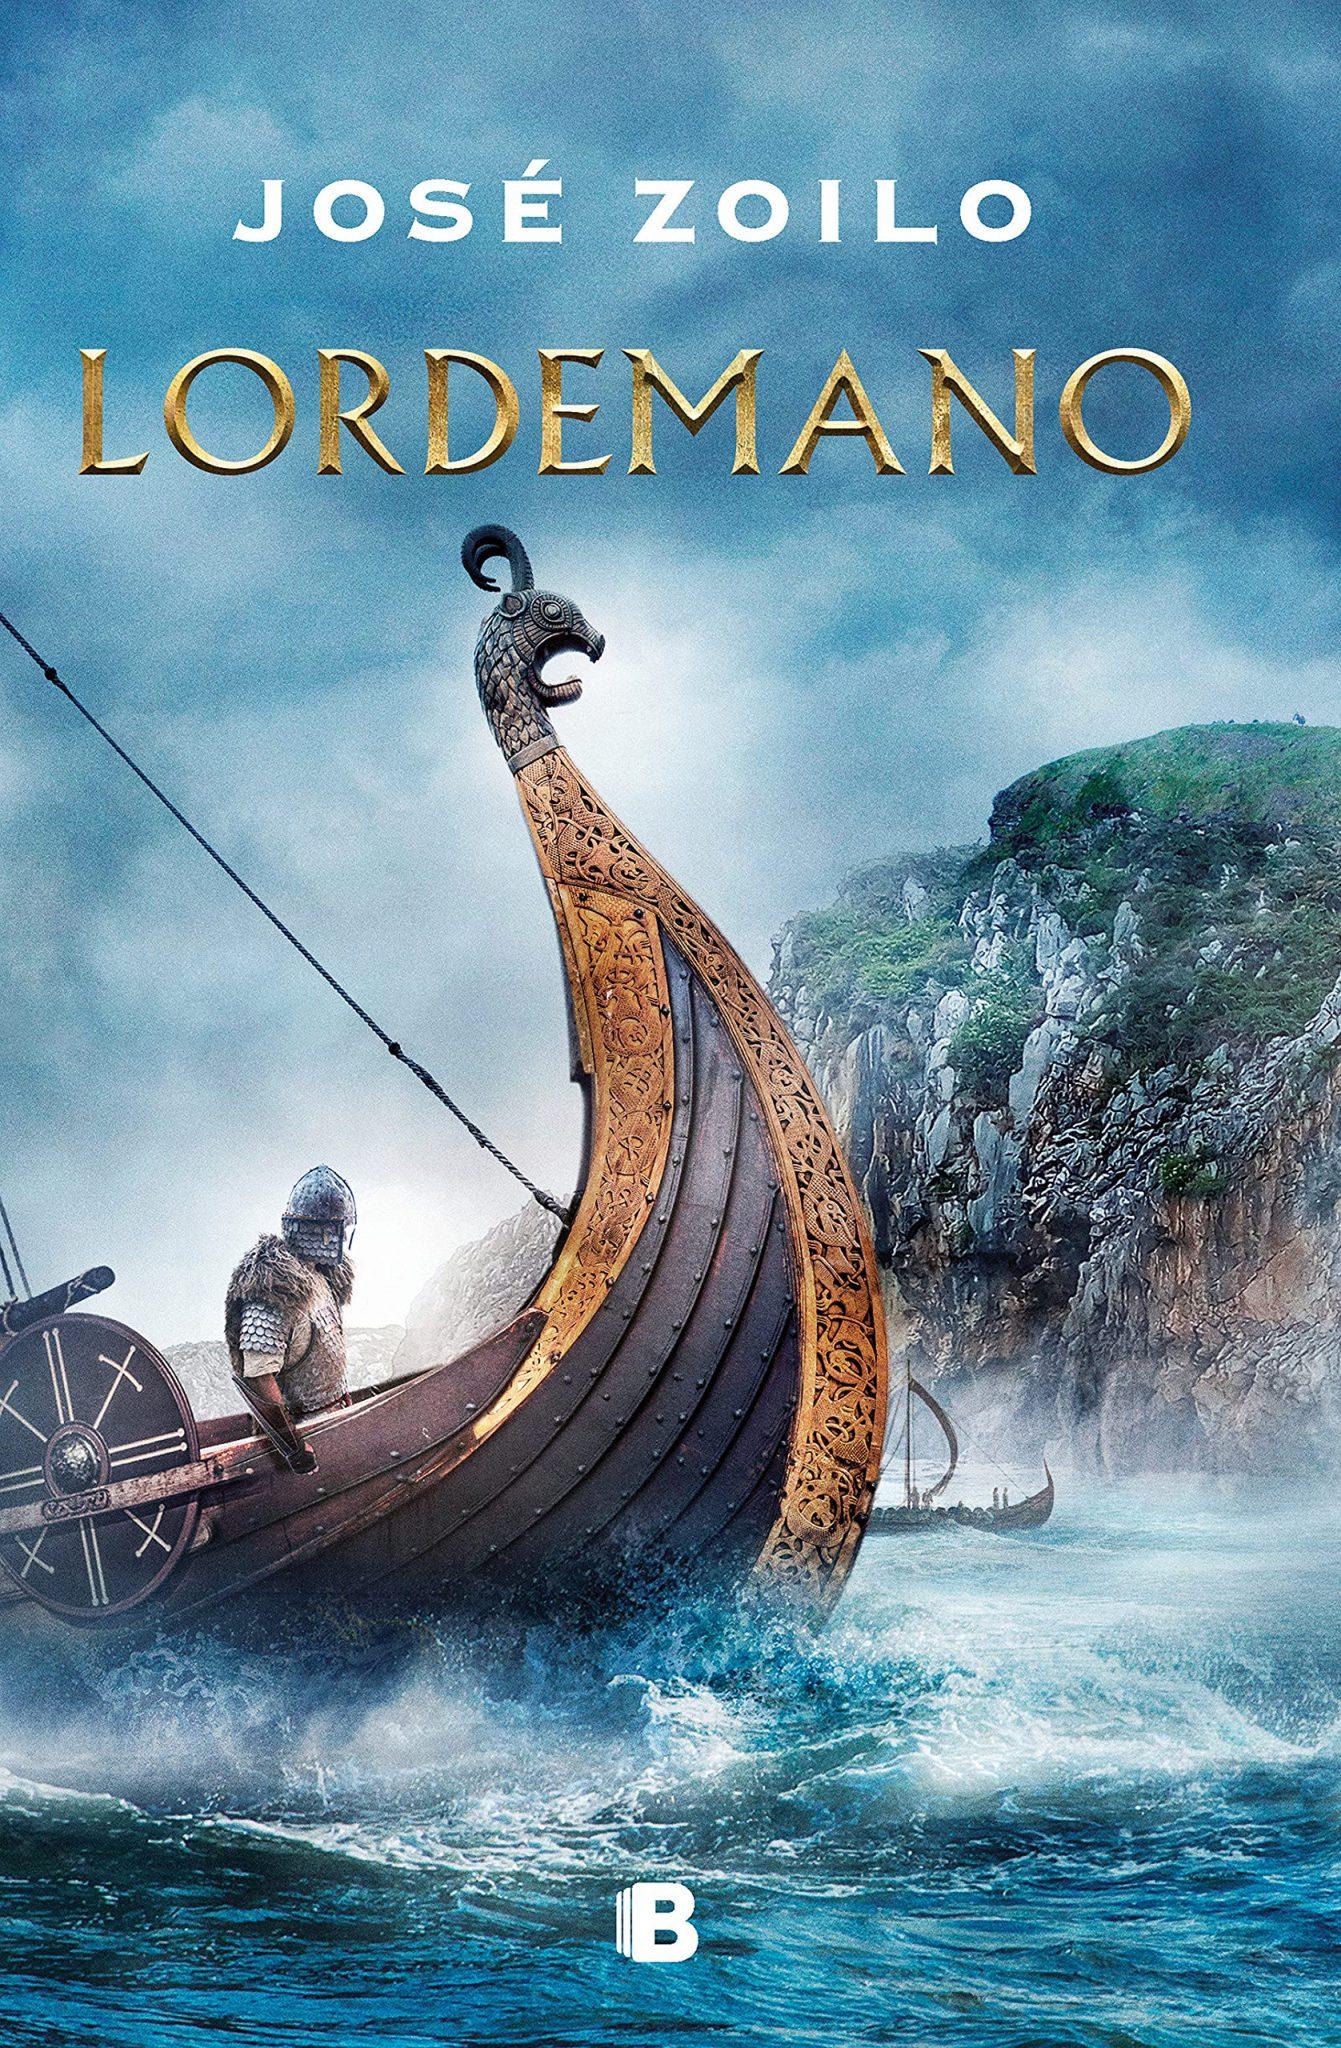 Lordemano Book Cover